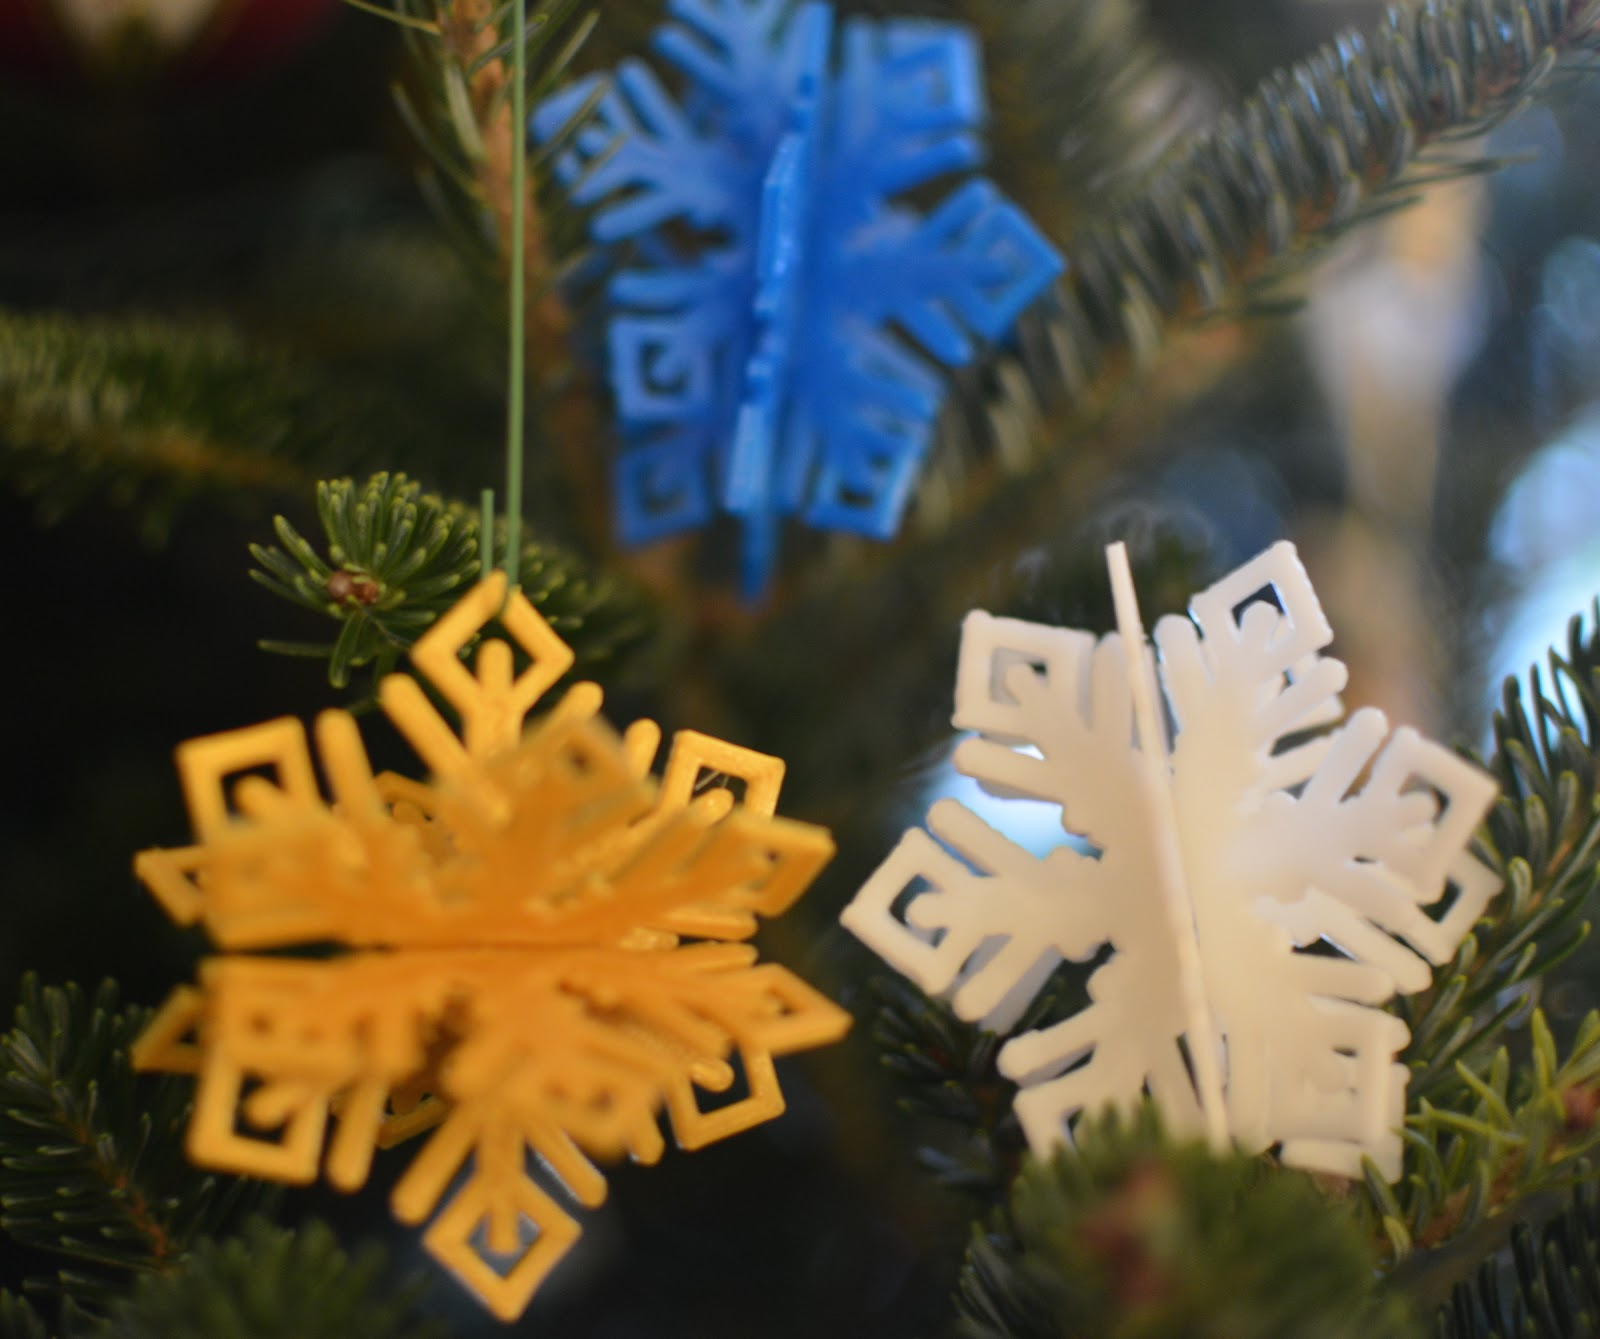 Snowflake Coaster 3D Printed Cute Holiday Seasonal Table Decor